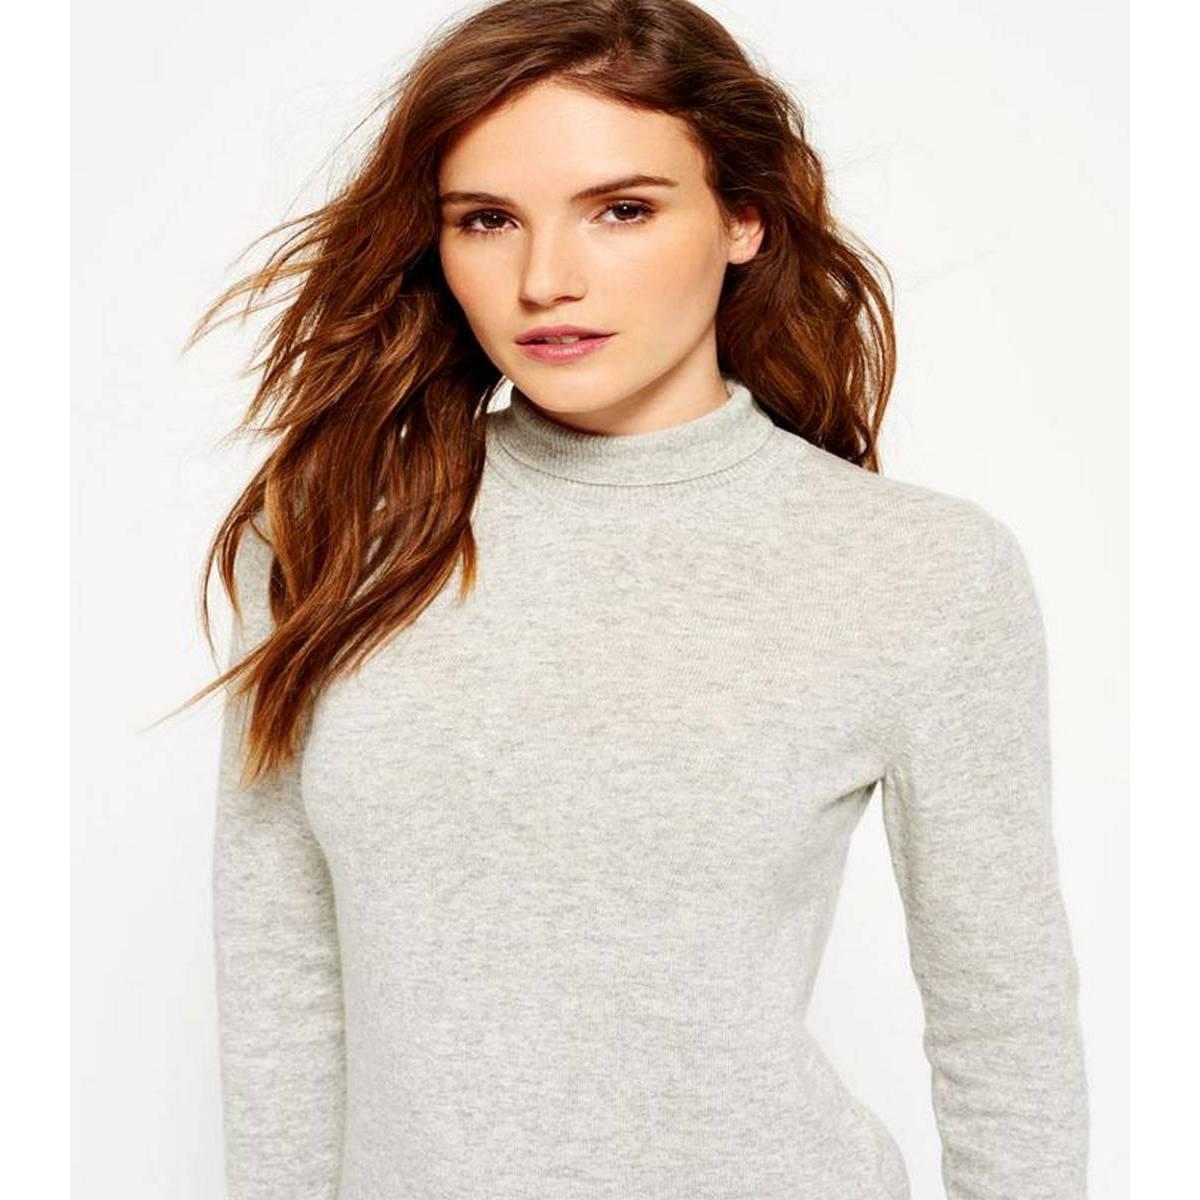 Winter Slim Fit High Neck for Women